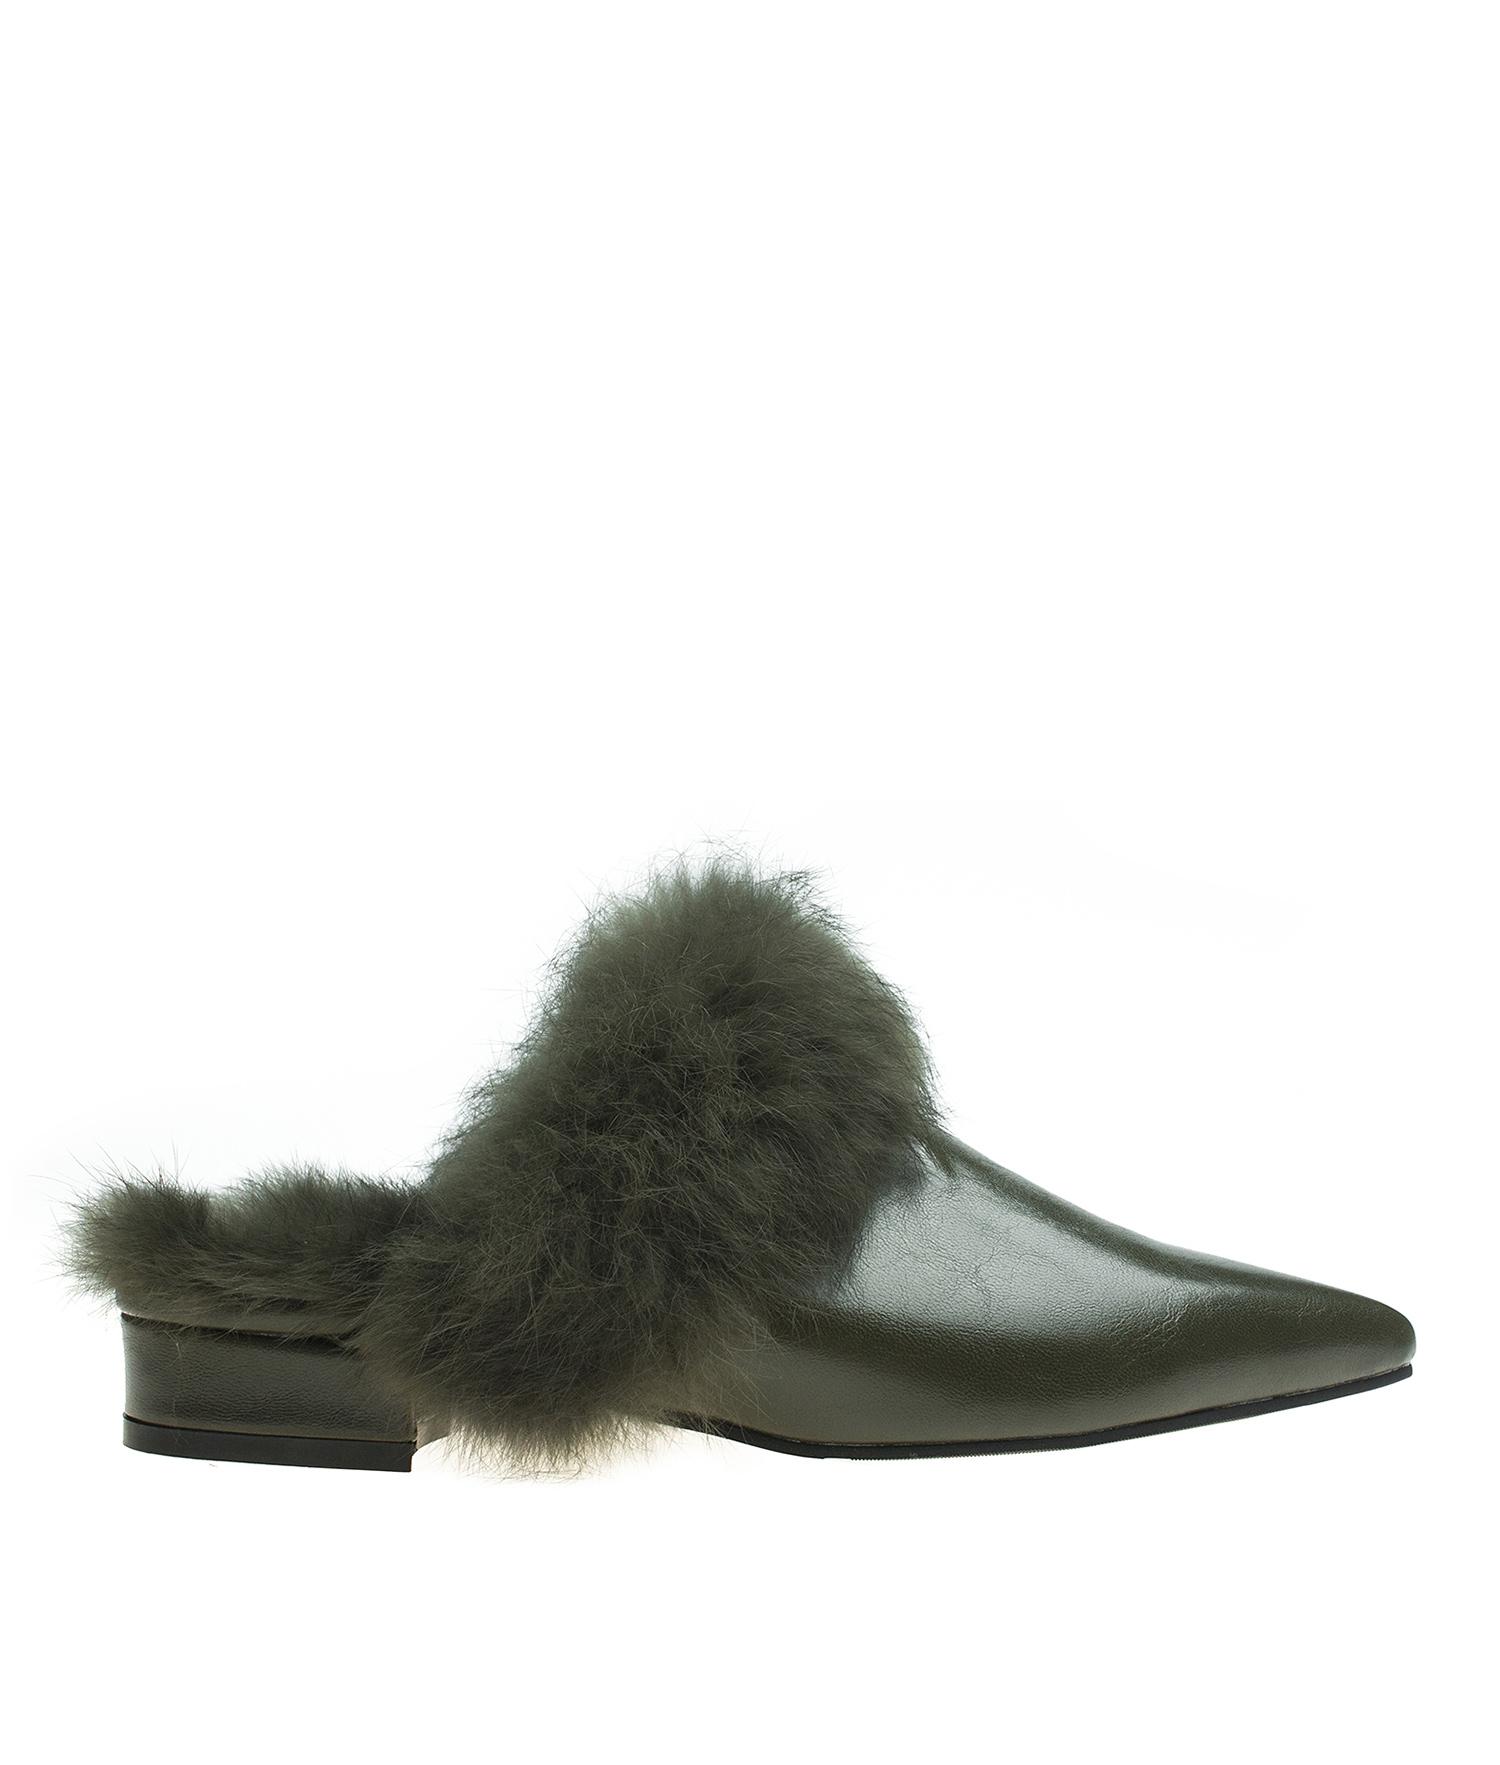 Polished Pointy Toe Fur Trim Flat Mules Annakastleshoes Com